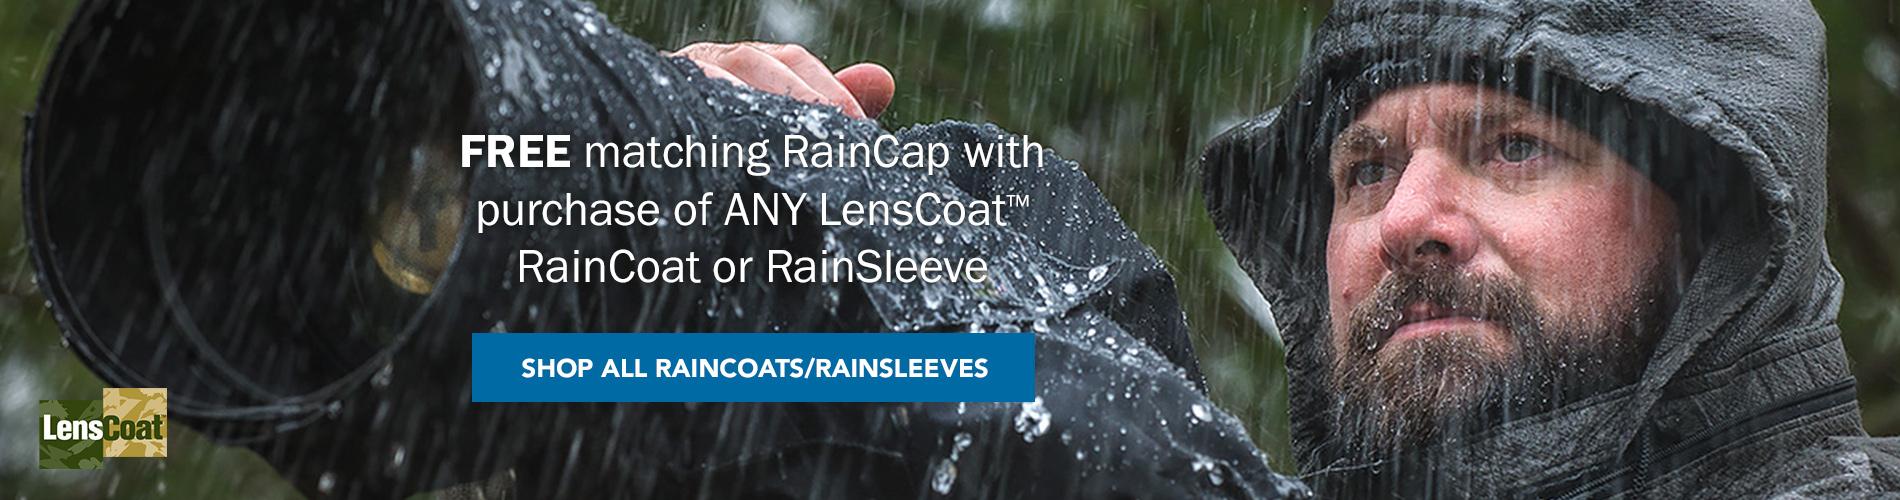 FREE matching RainCap with purchase of ANY LensCoat RainCoat or RainSleeve. Shop All RainCoats / RainSleeves >